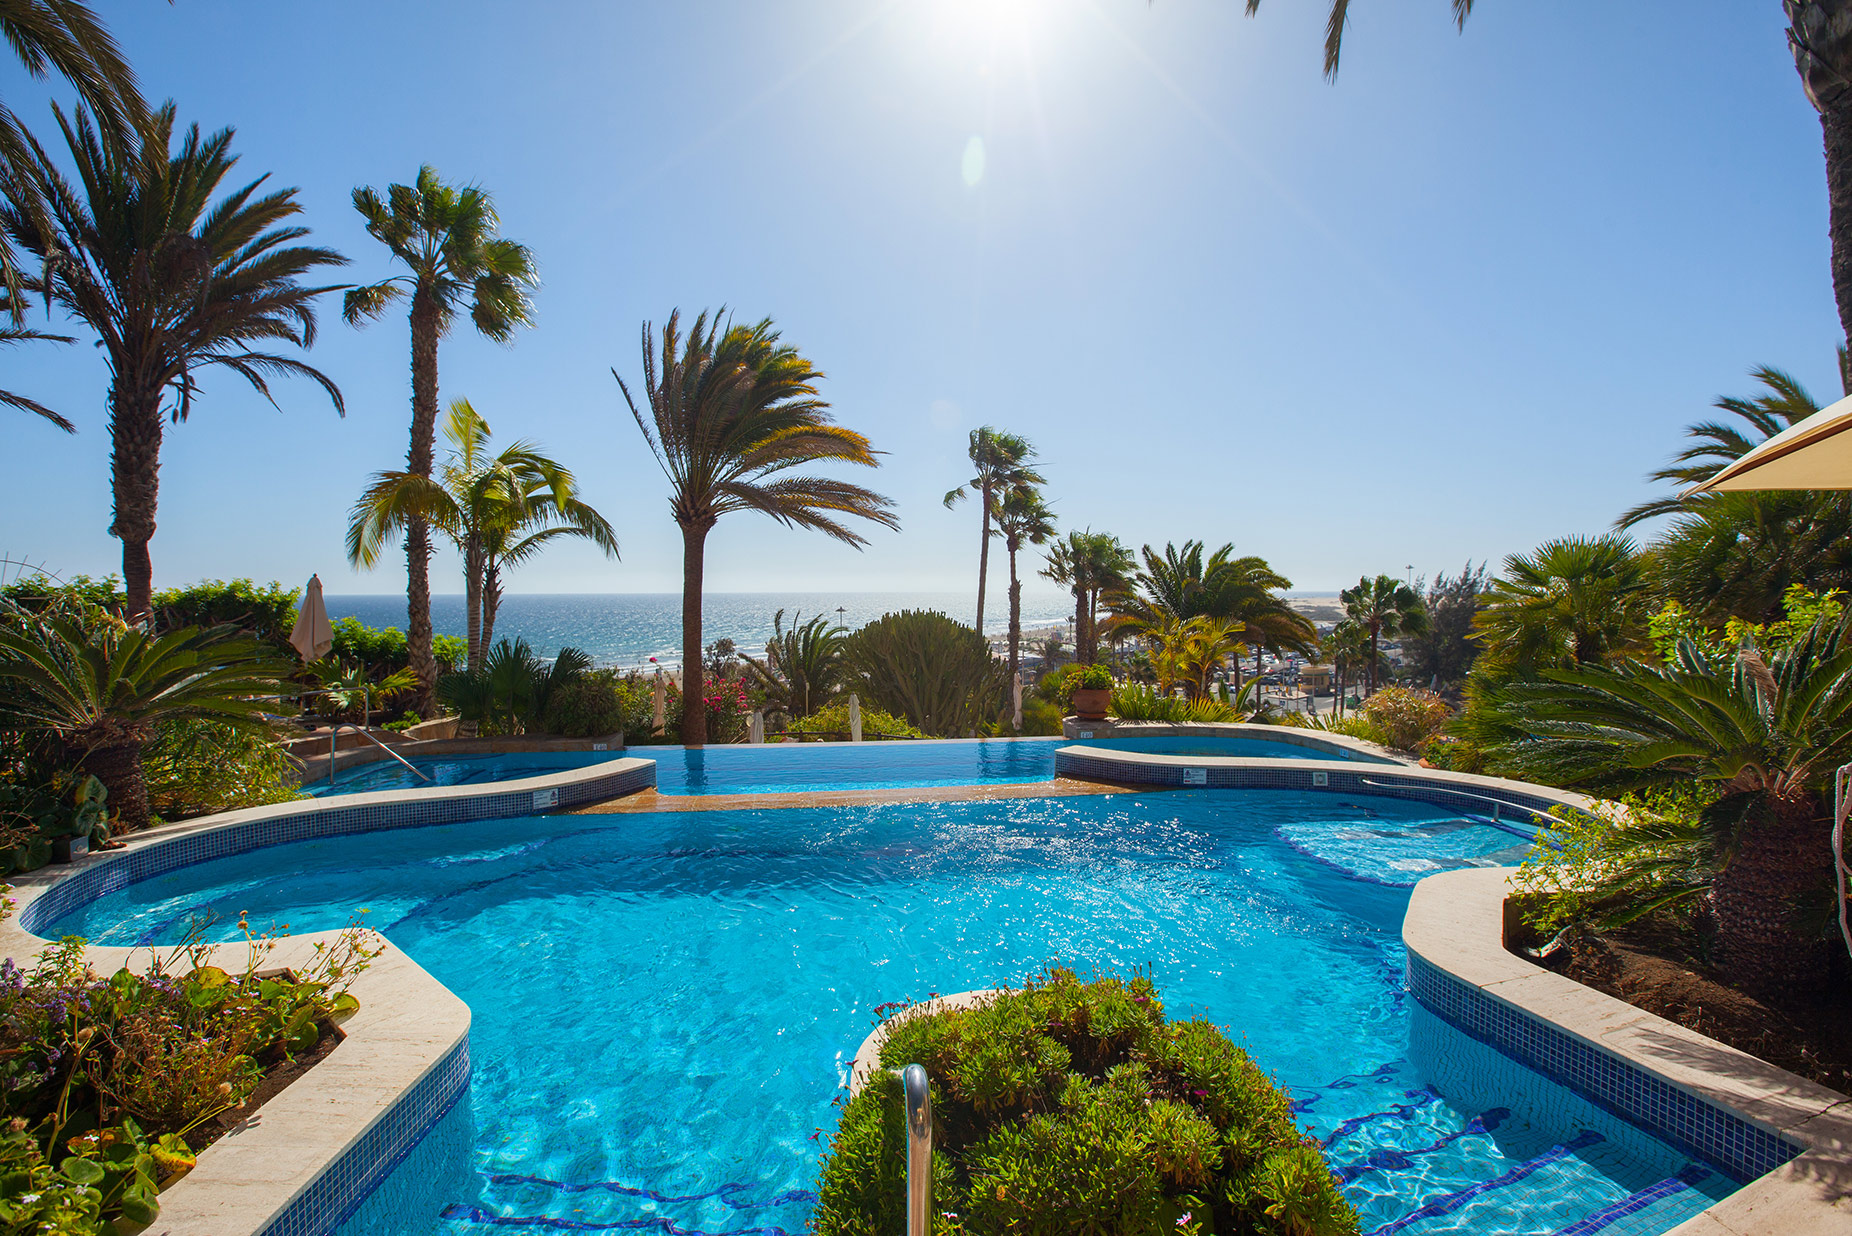 Corallium Dunamar by Lopesan Hotels (Gran Canaria)